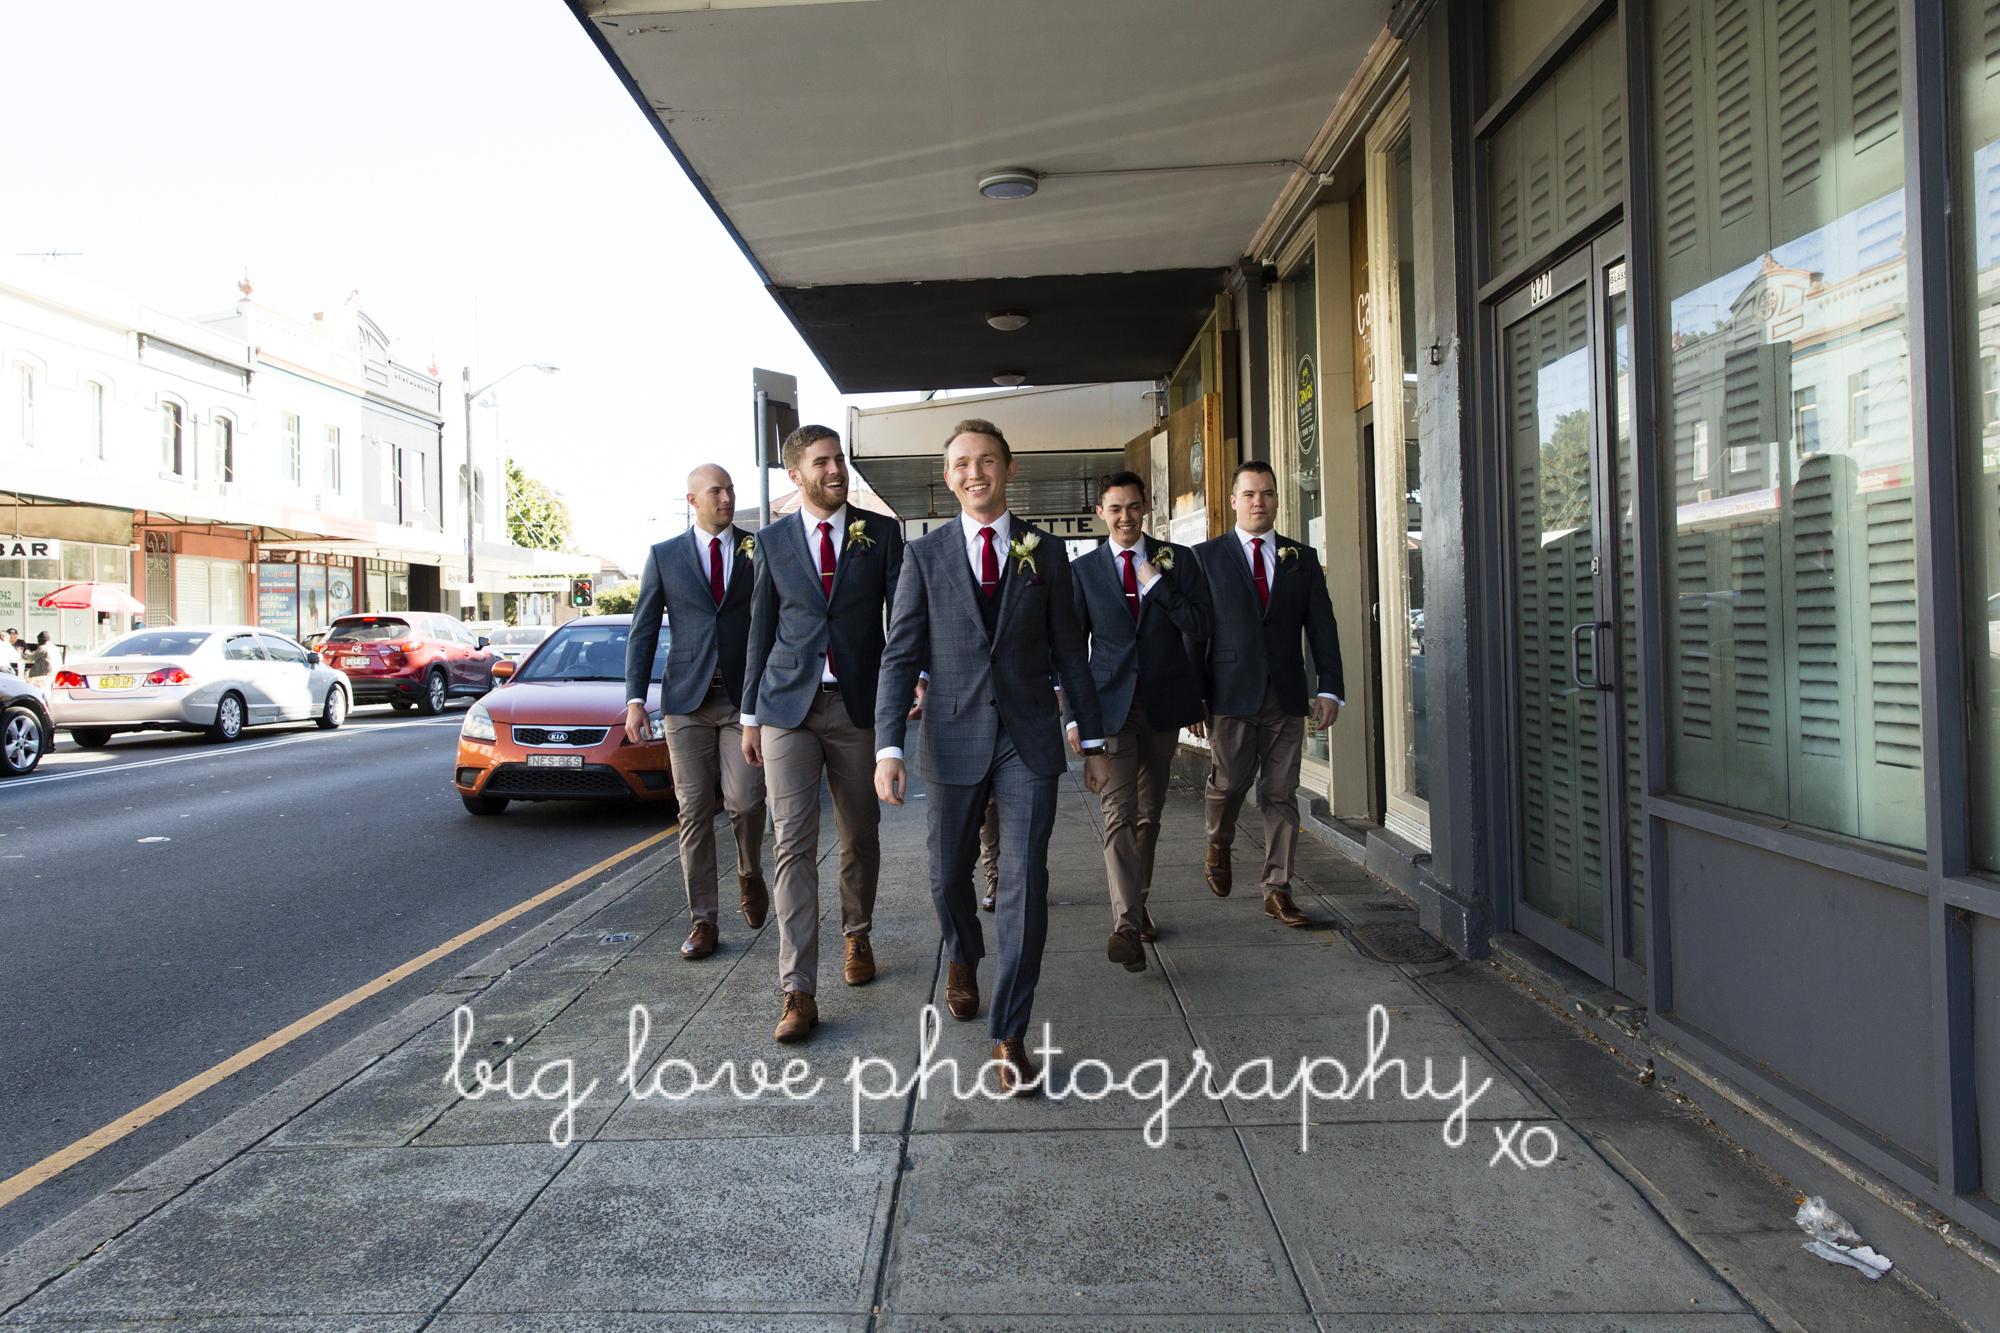 sydneyphotographer-1009.jpg